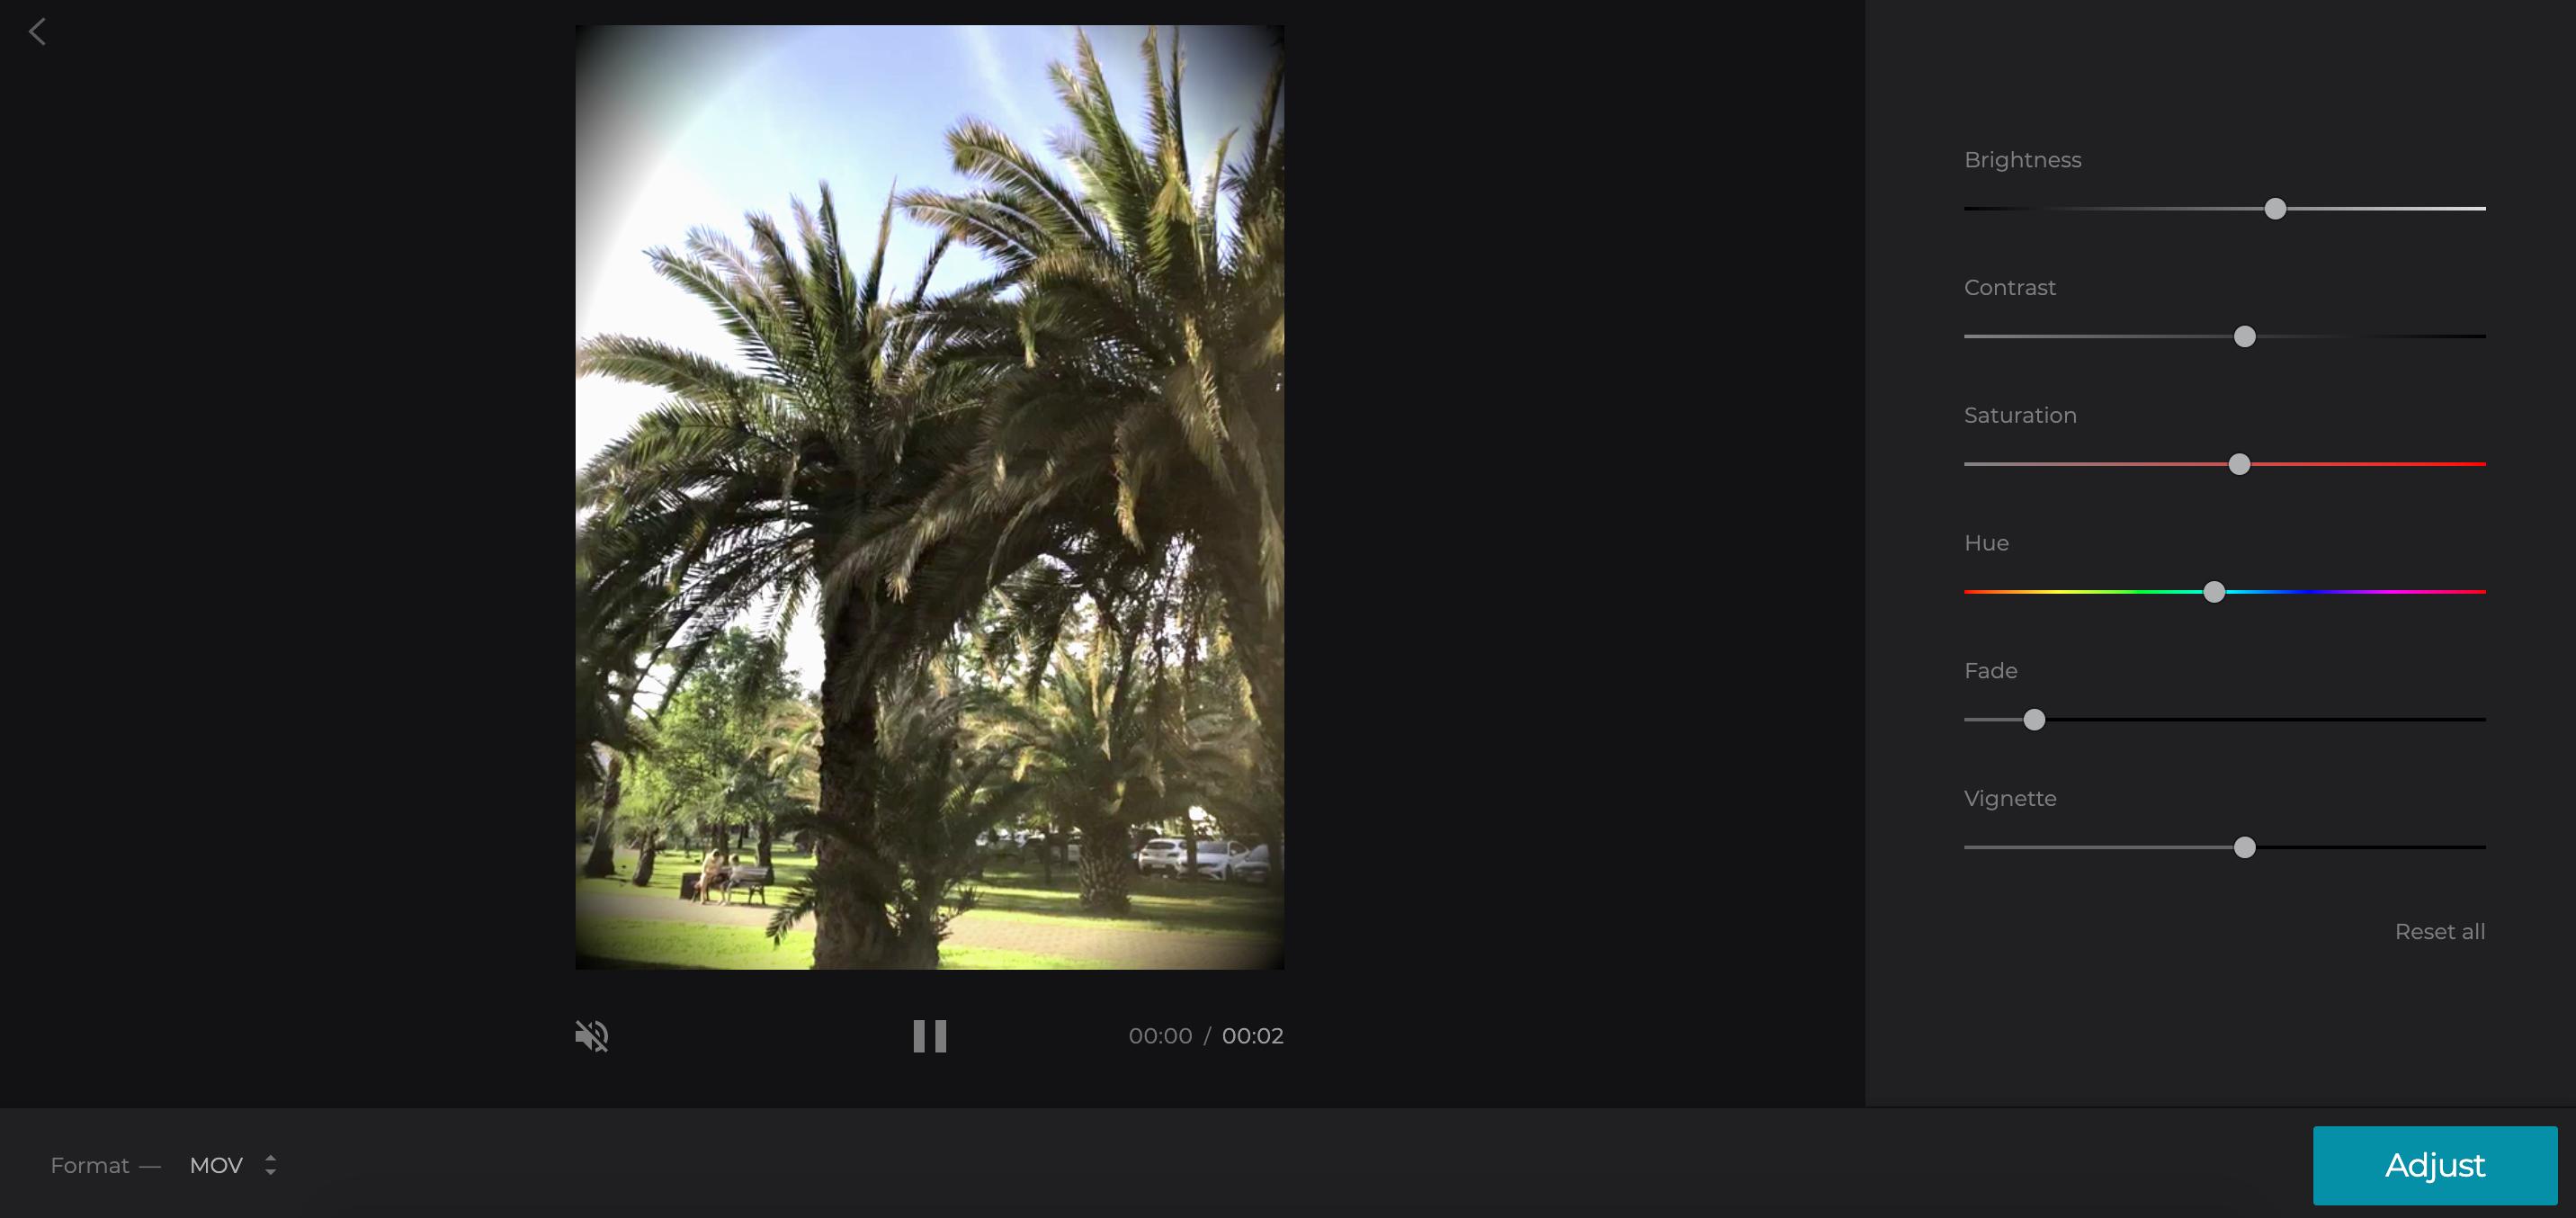 Add and adjust video vignette